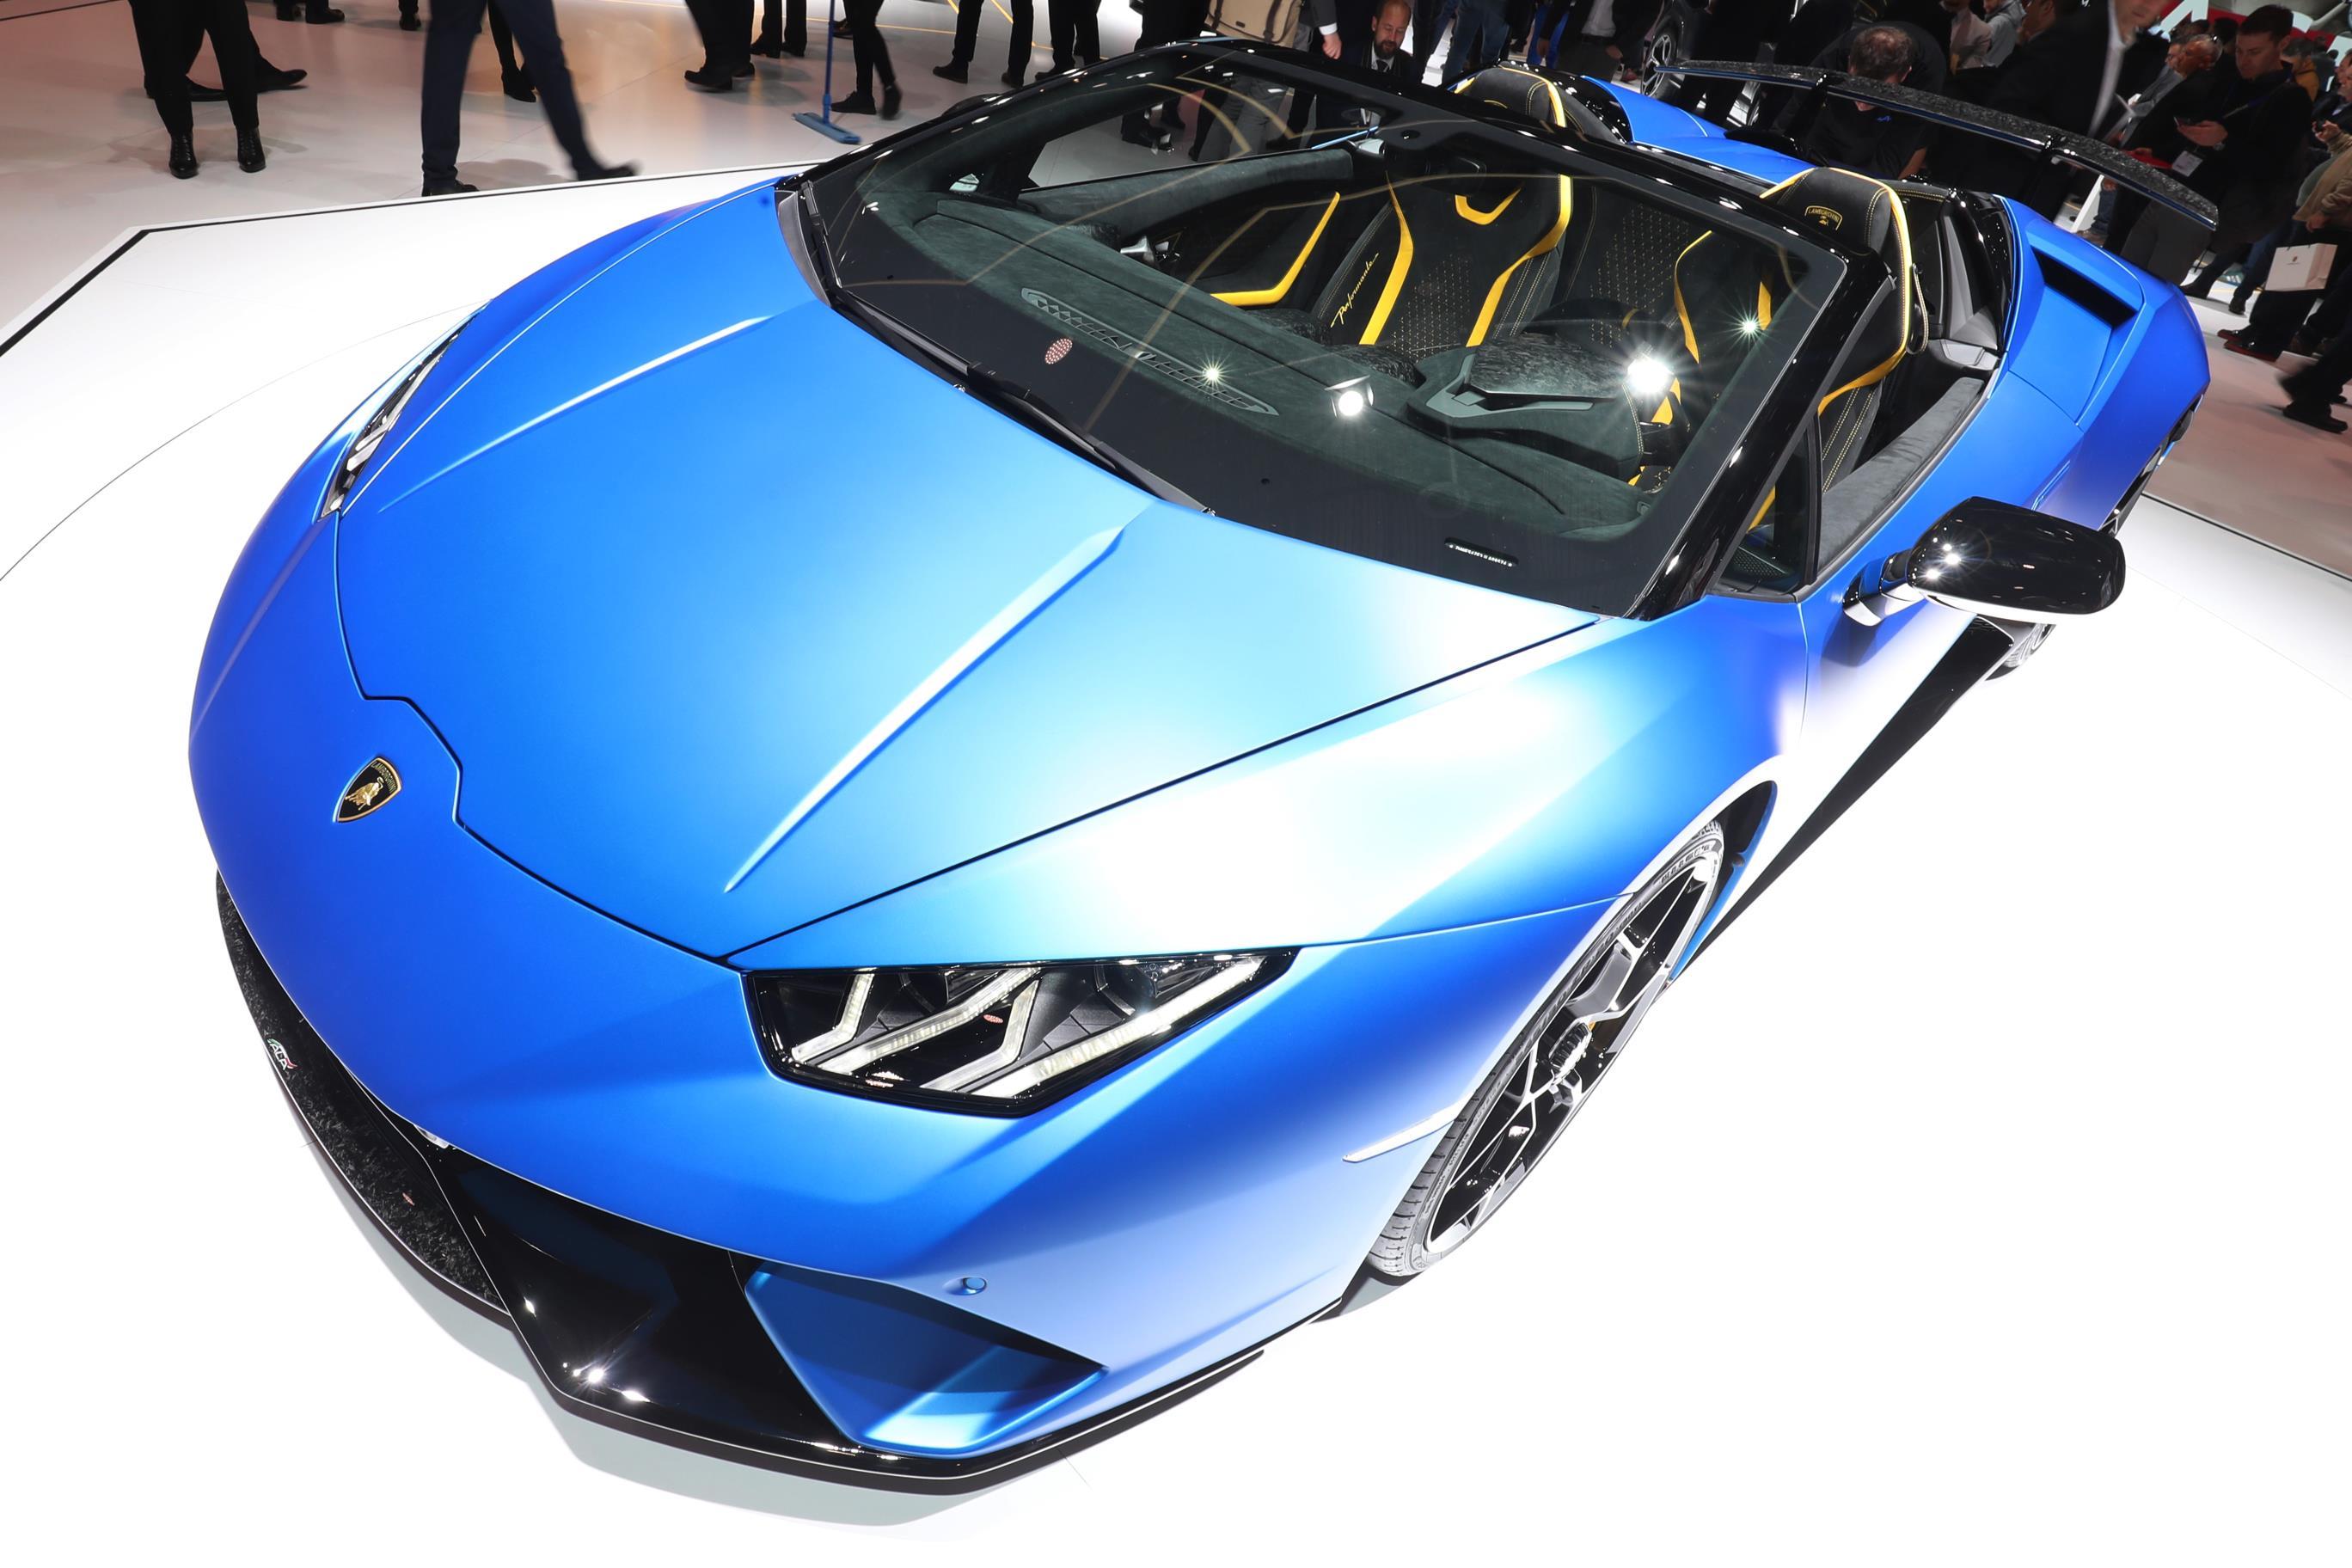 Geneva Motor Show 2018 Mega Gallery Part 1 (248)